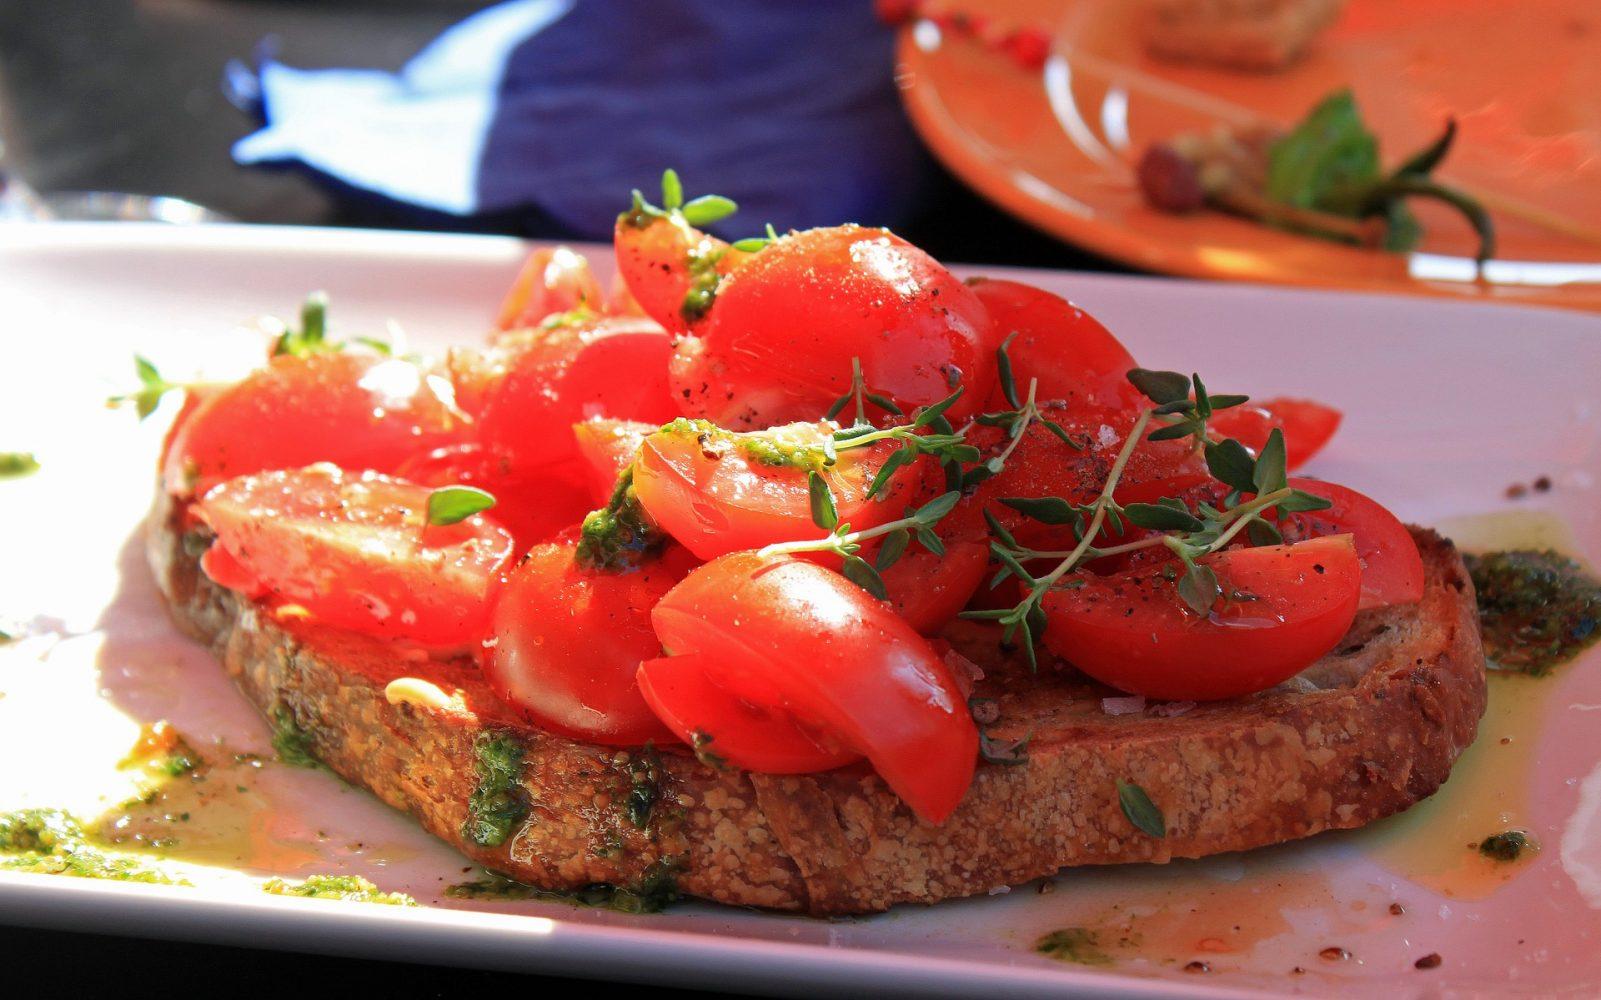 to biosta de tomate cherry